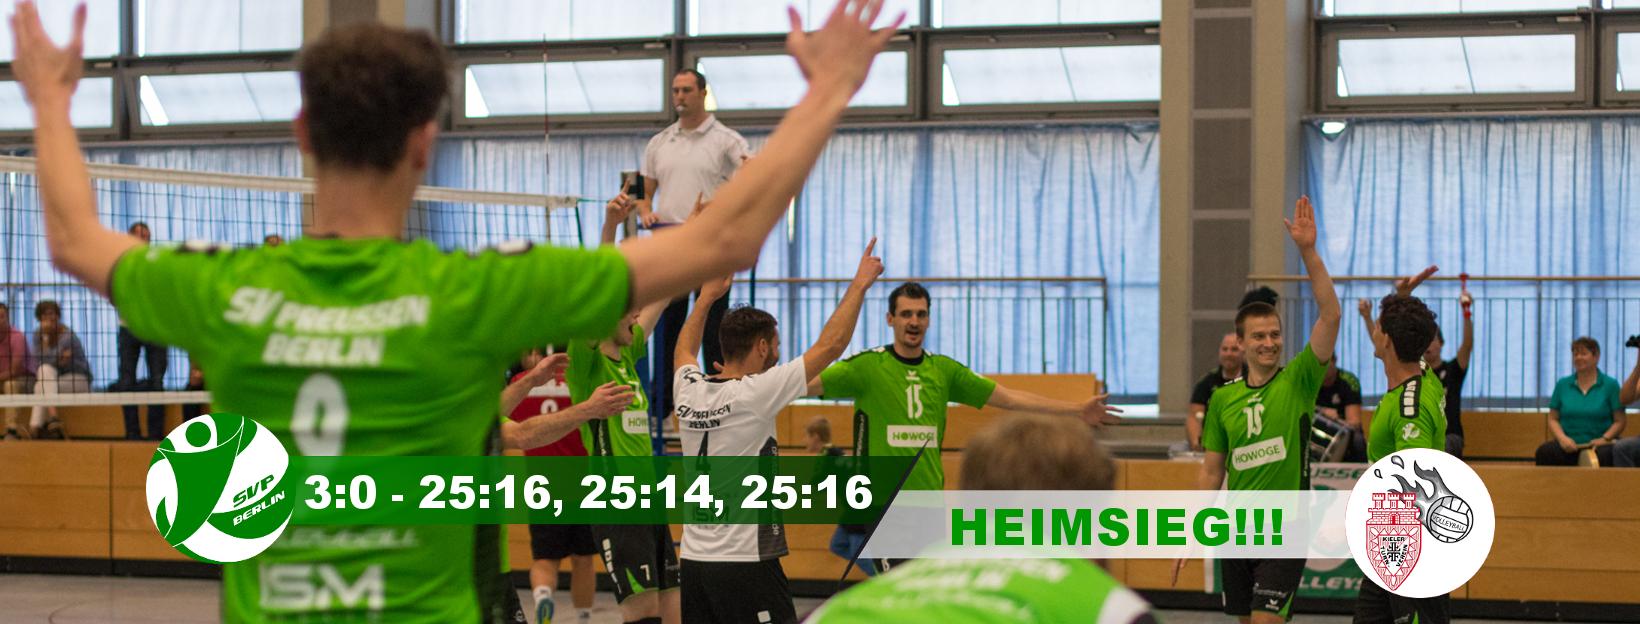 5. Spieltag gegen den Kieler TV 2